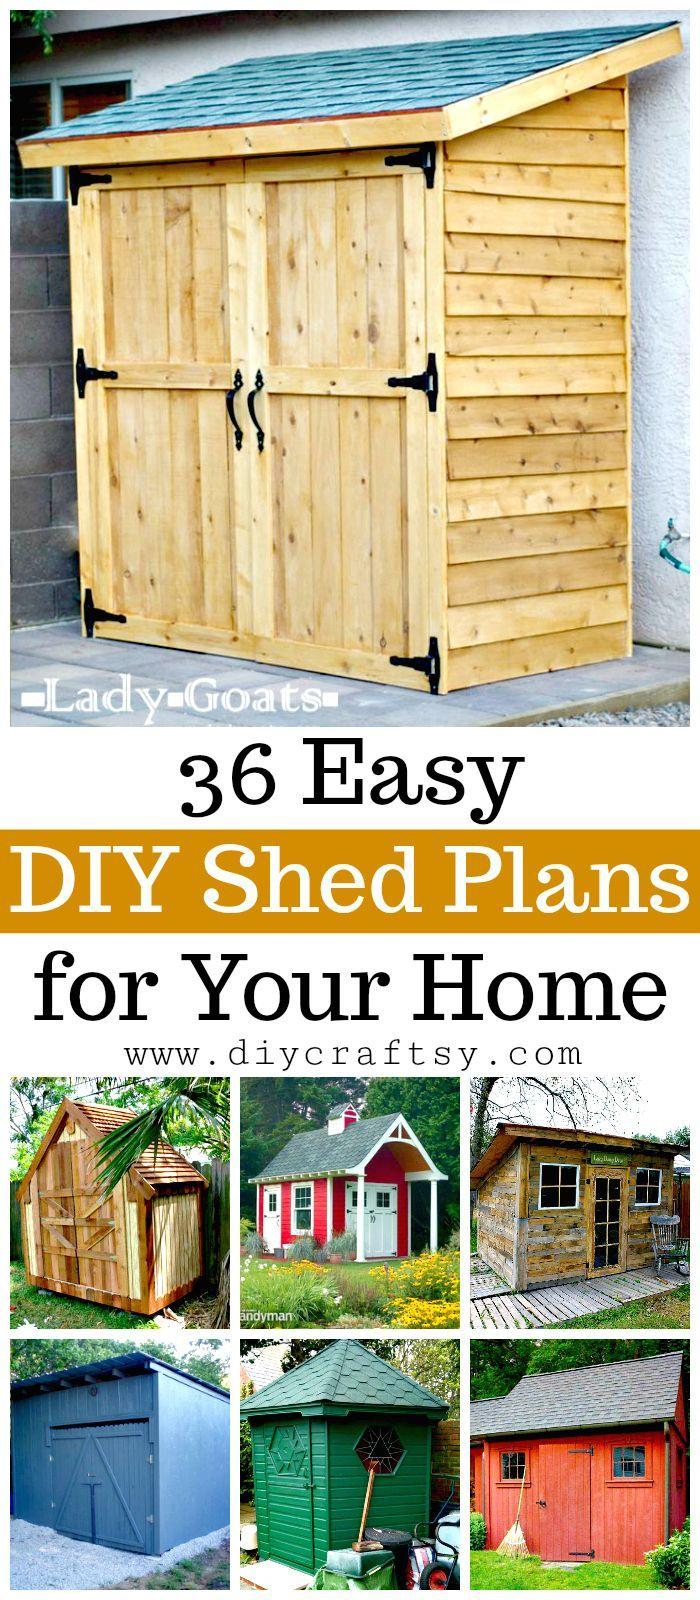 DIY Shed Plans - 36 Easy DIY Shed Designs for Your Home   Pinterest ...